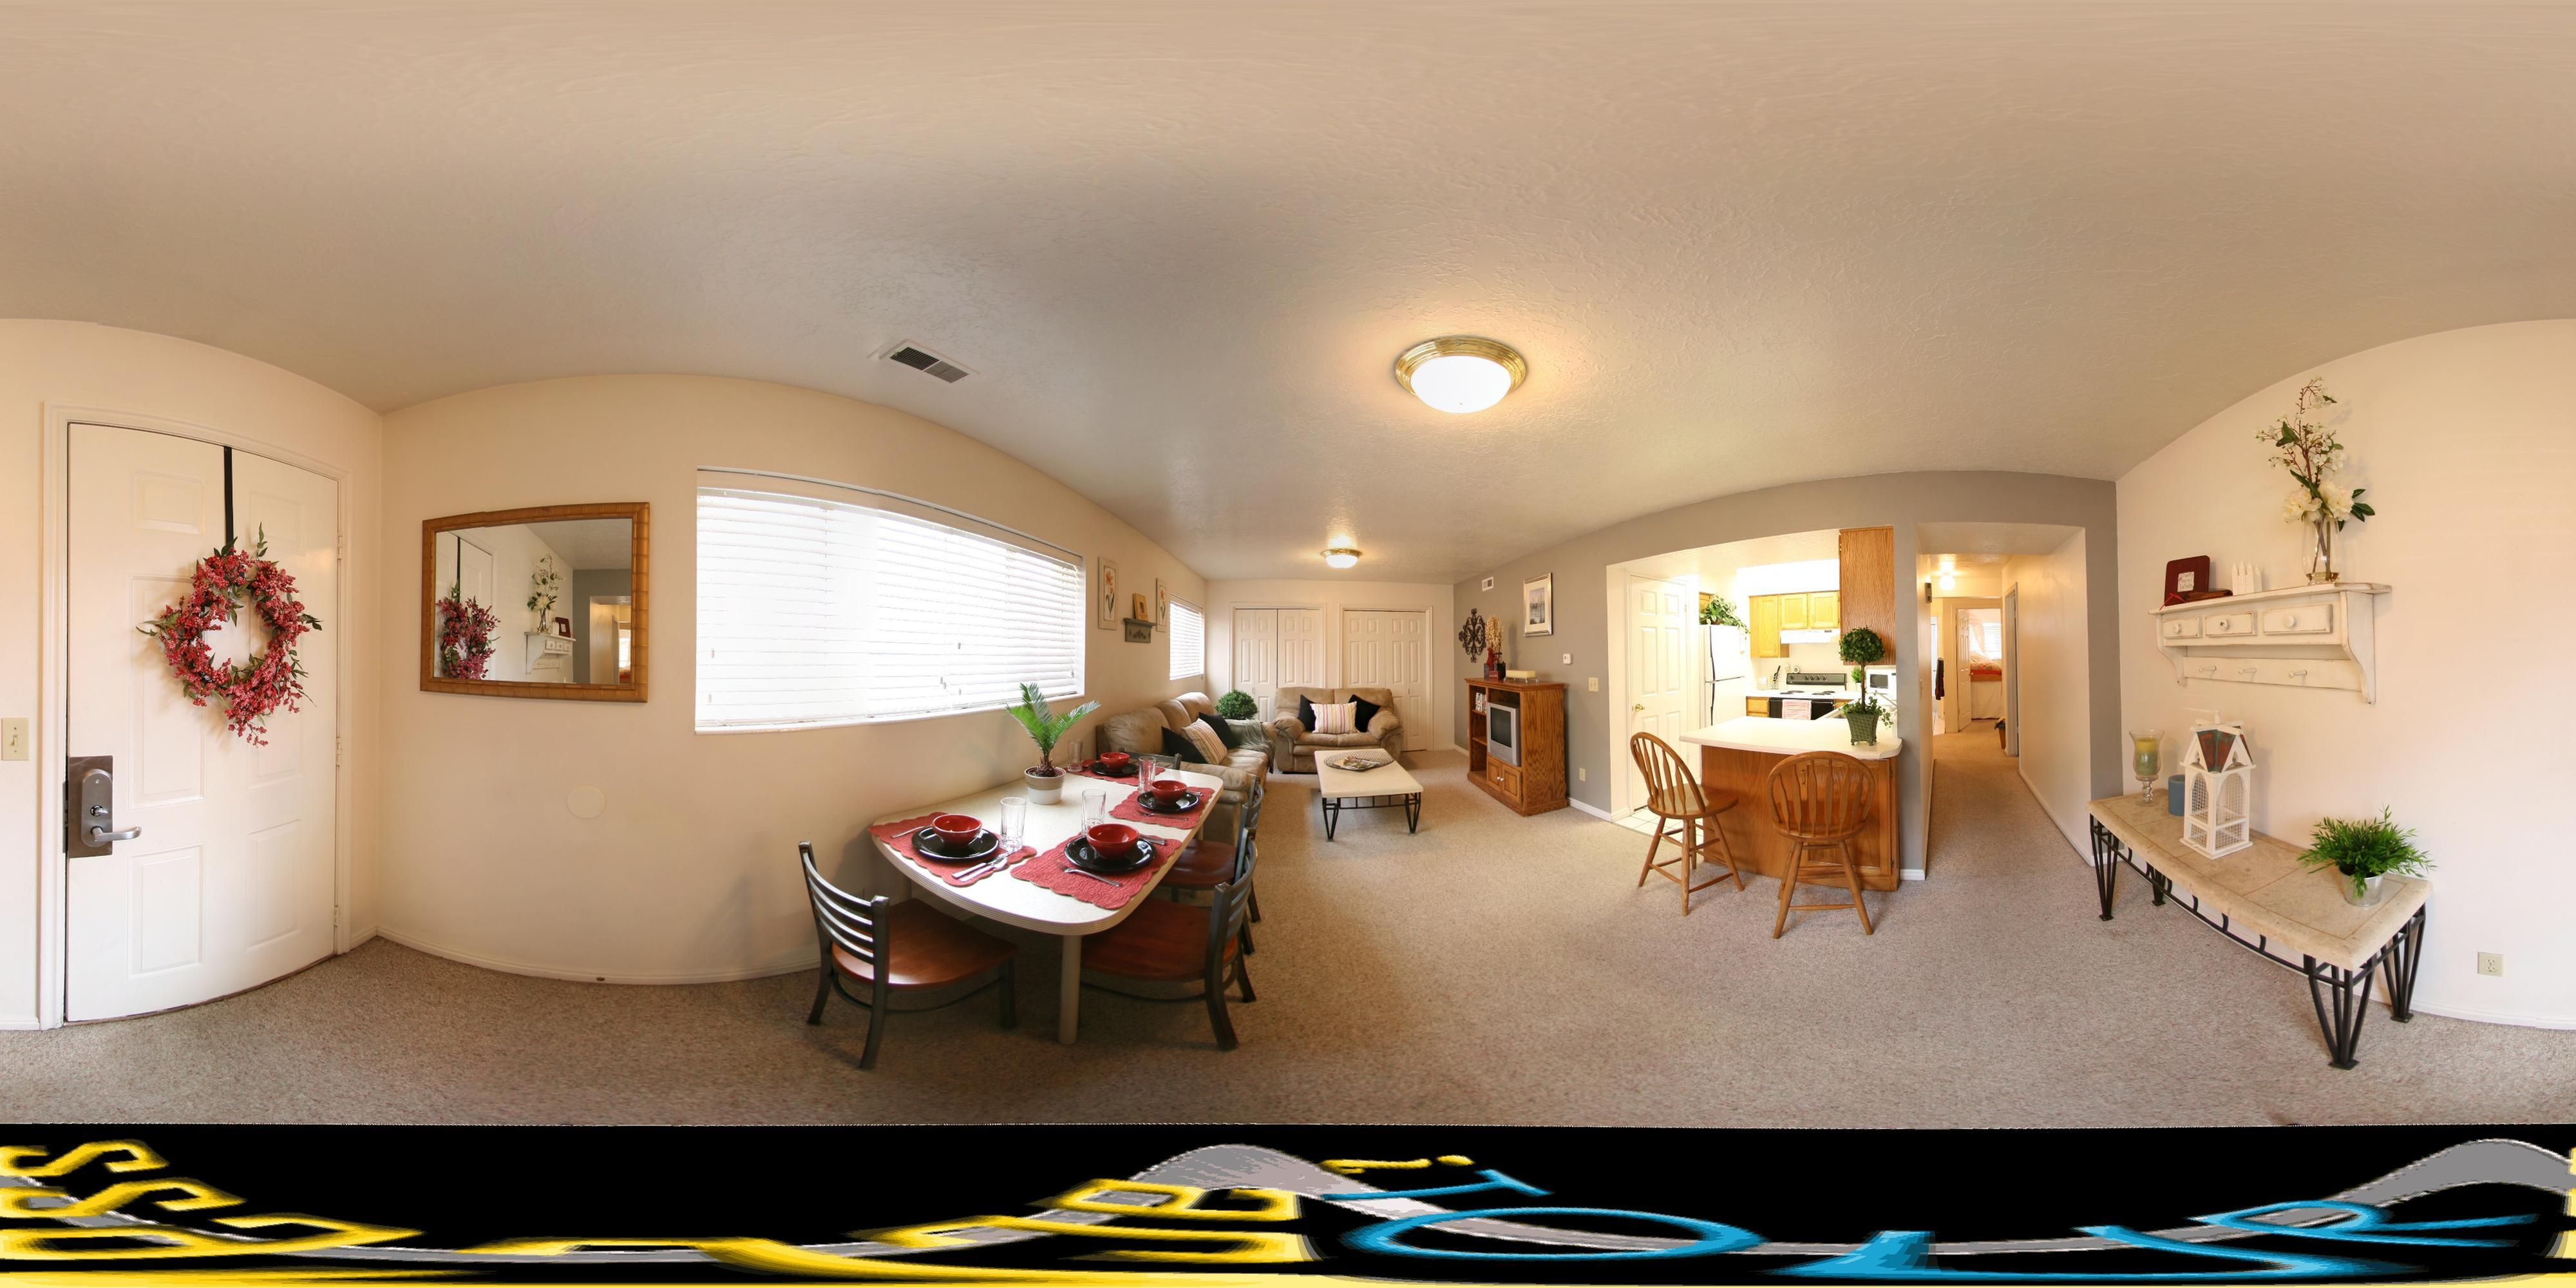 2 Bedroom Large - Living Room